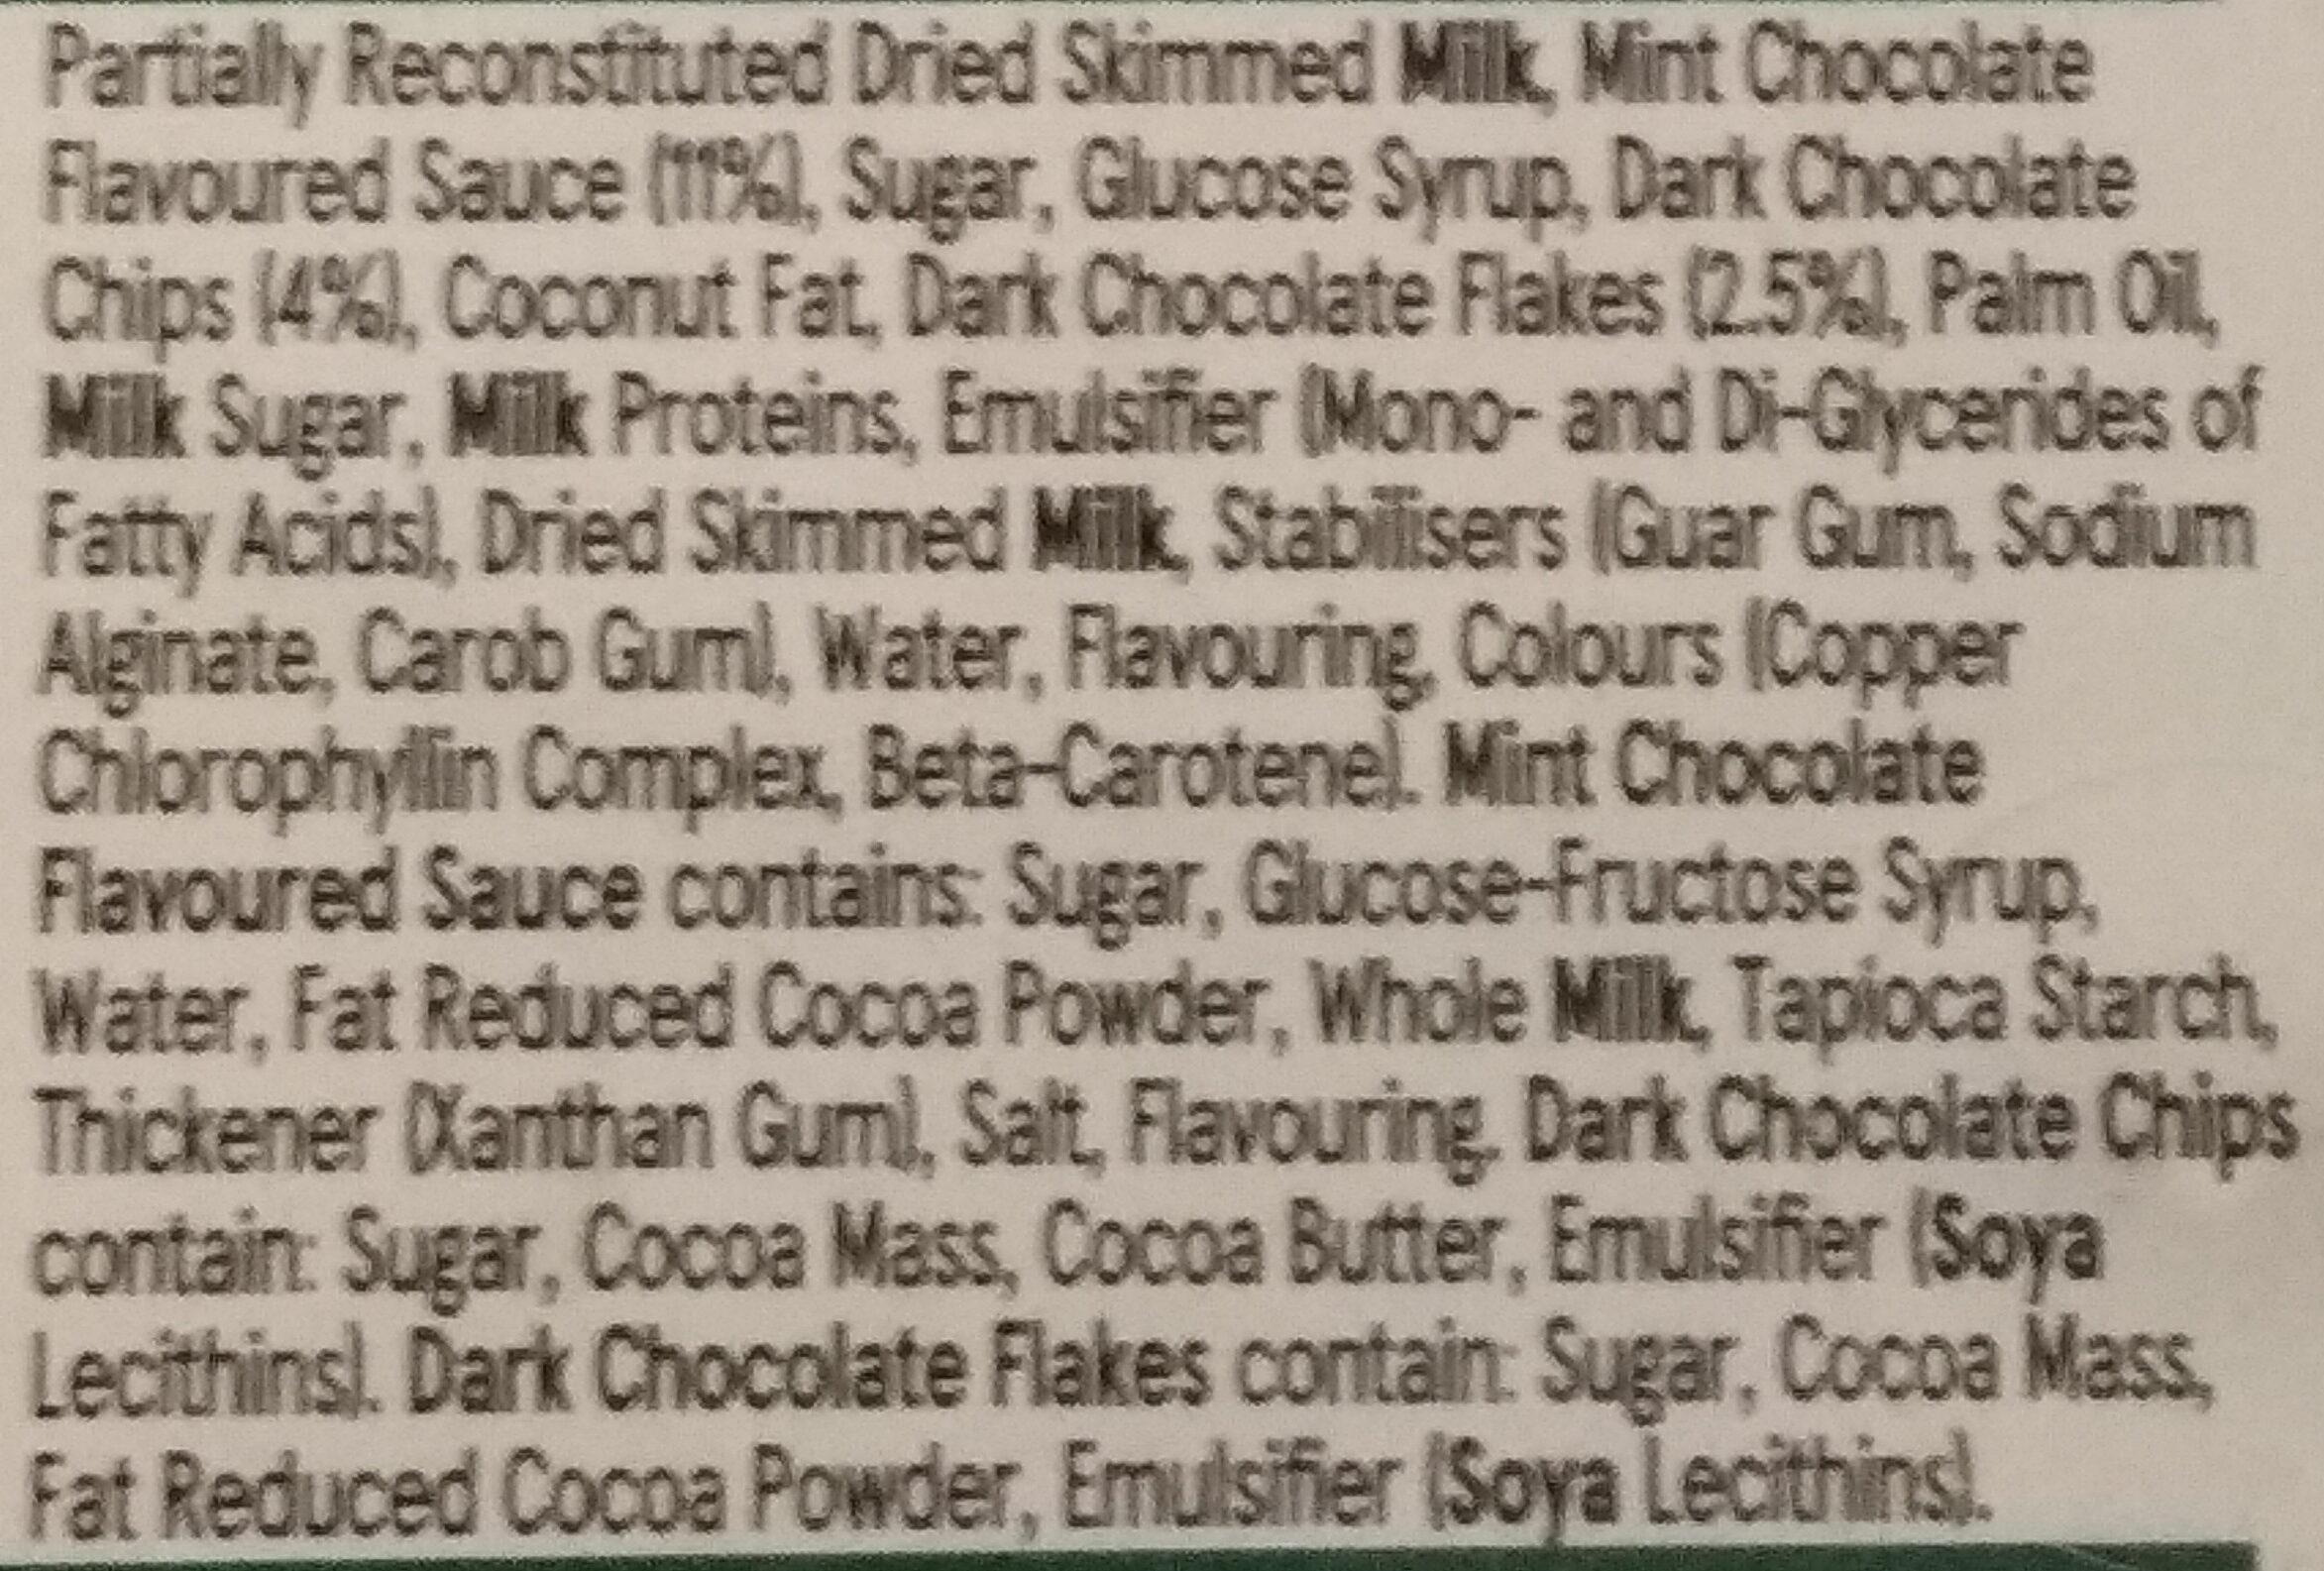 mint chocolate ice cream - Ingredients - en